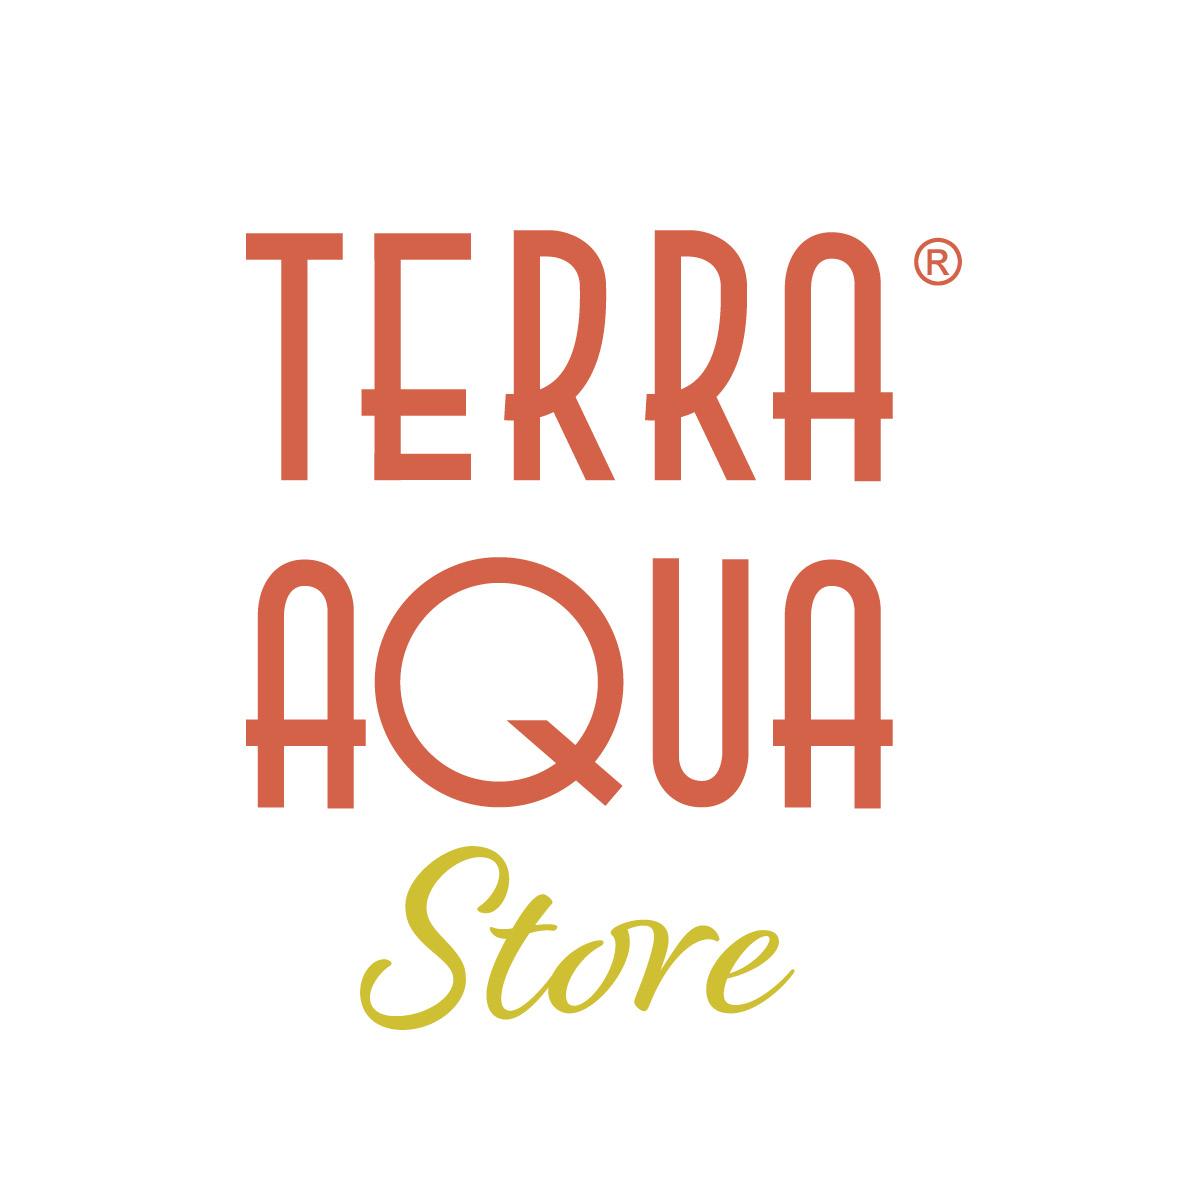 terraaqua.store